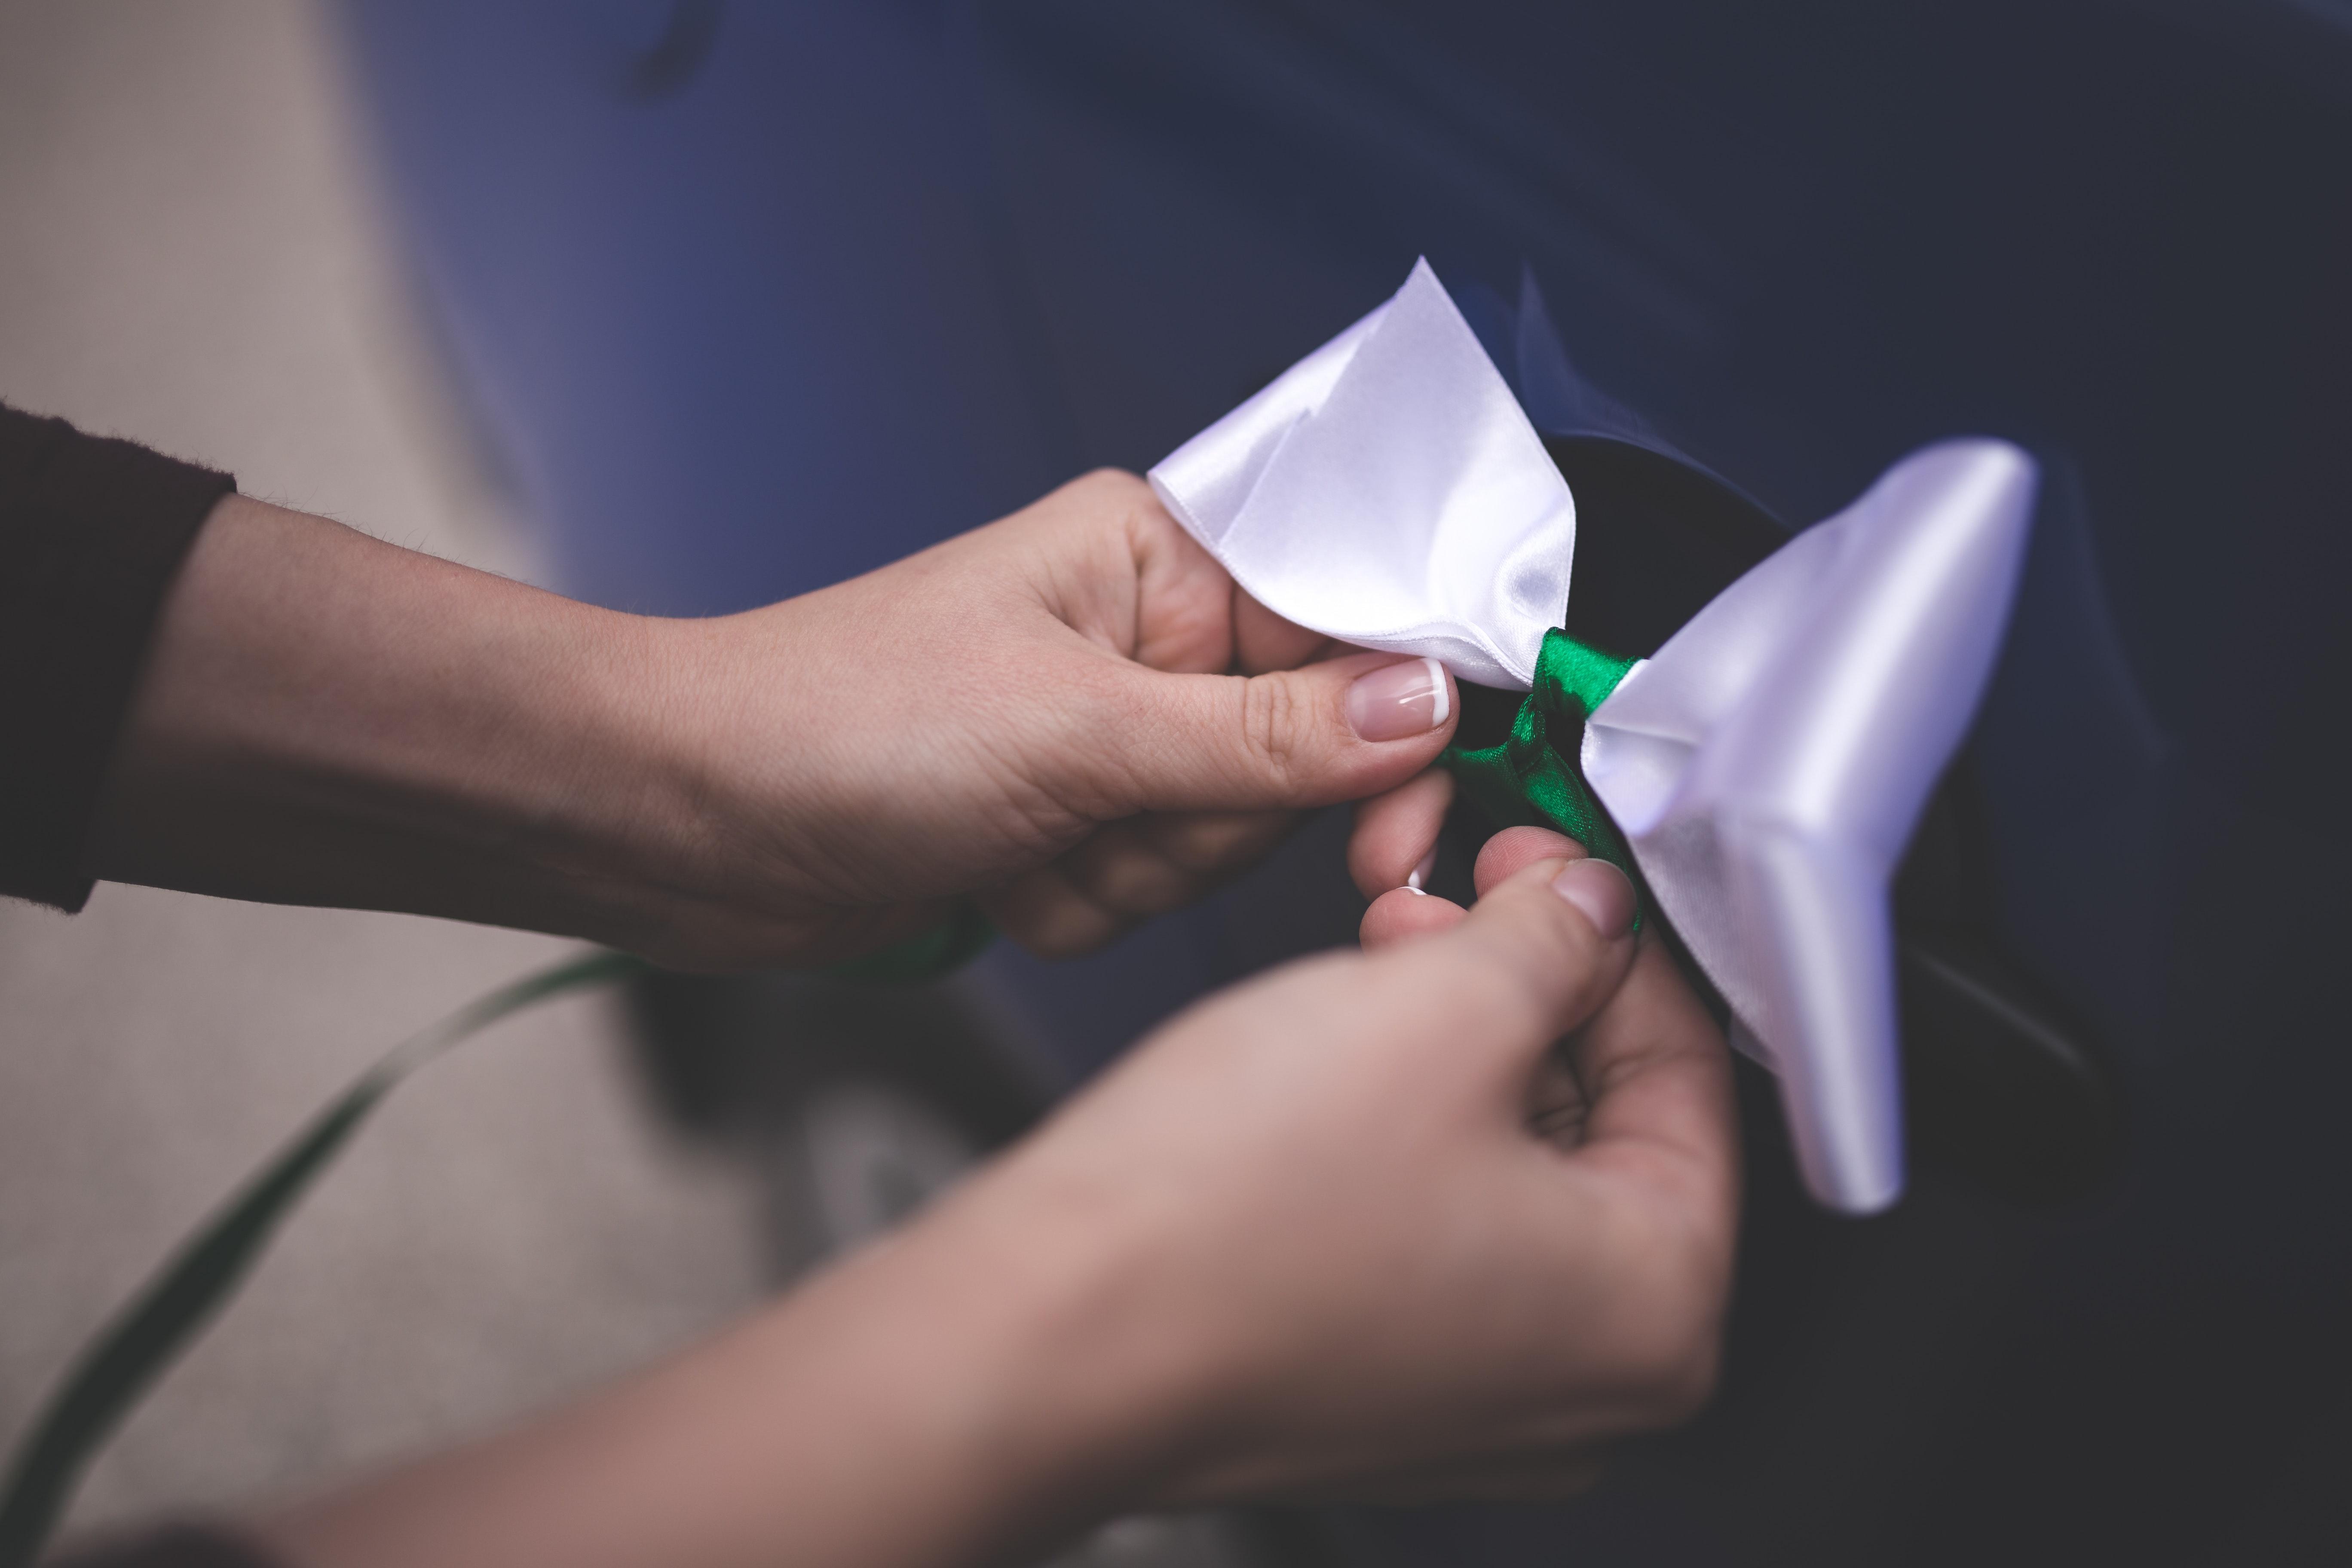 Woman tying a white bow photo